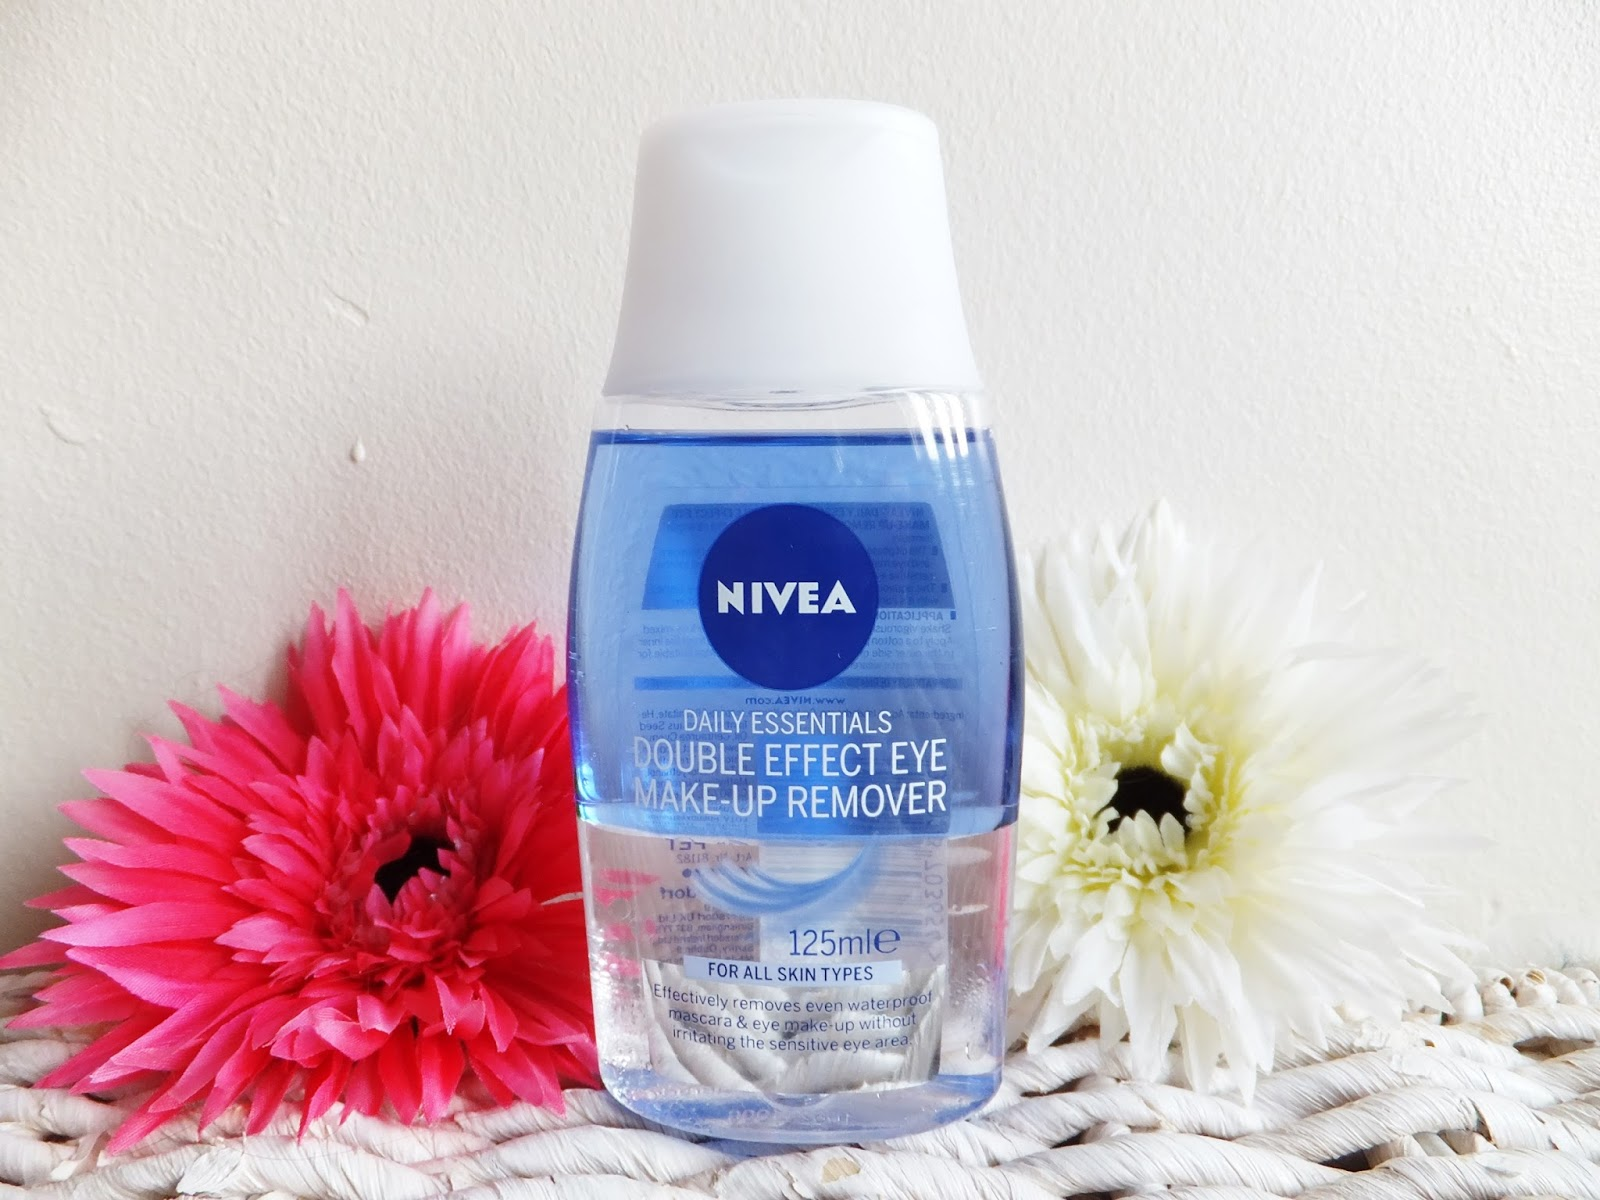 Fern Blush Nivea Daily Essentials Double Effect Eye Makeup